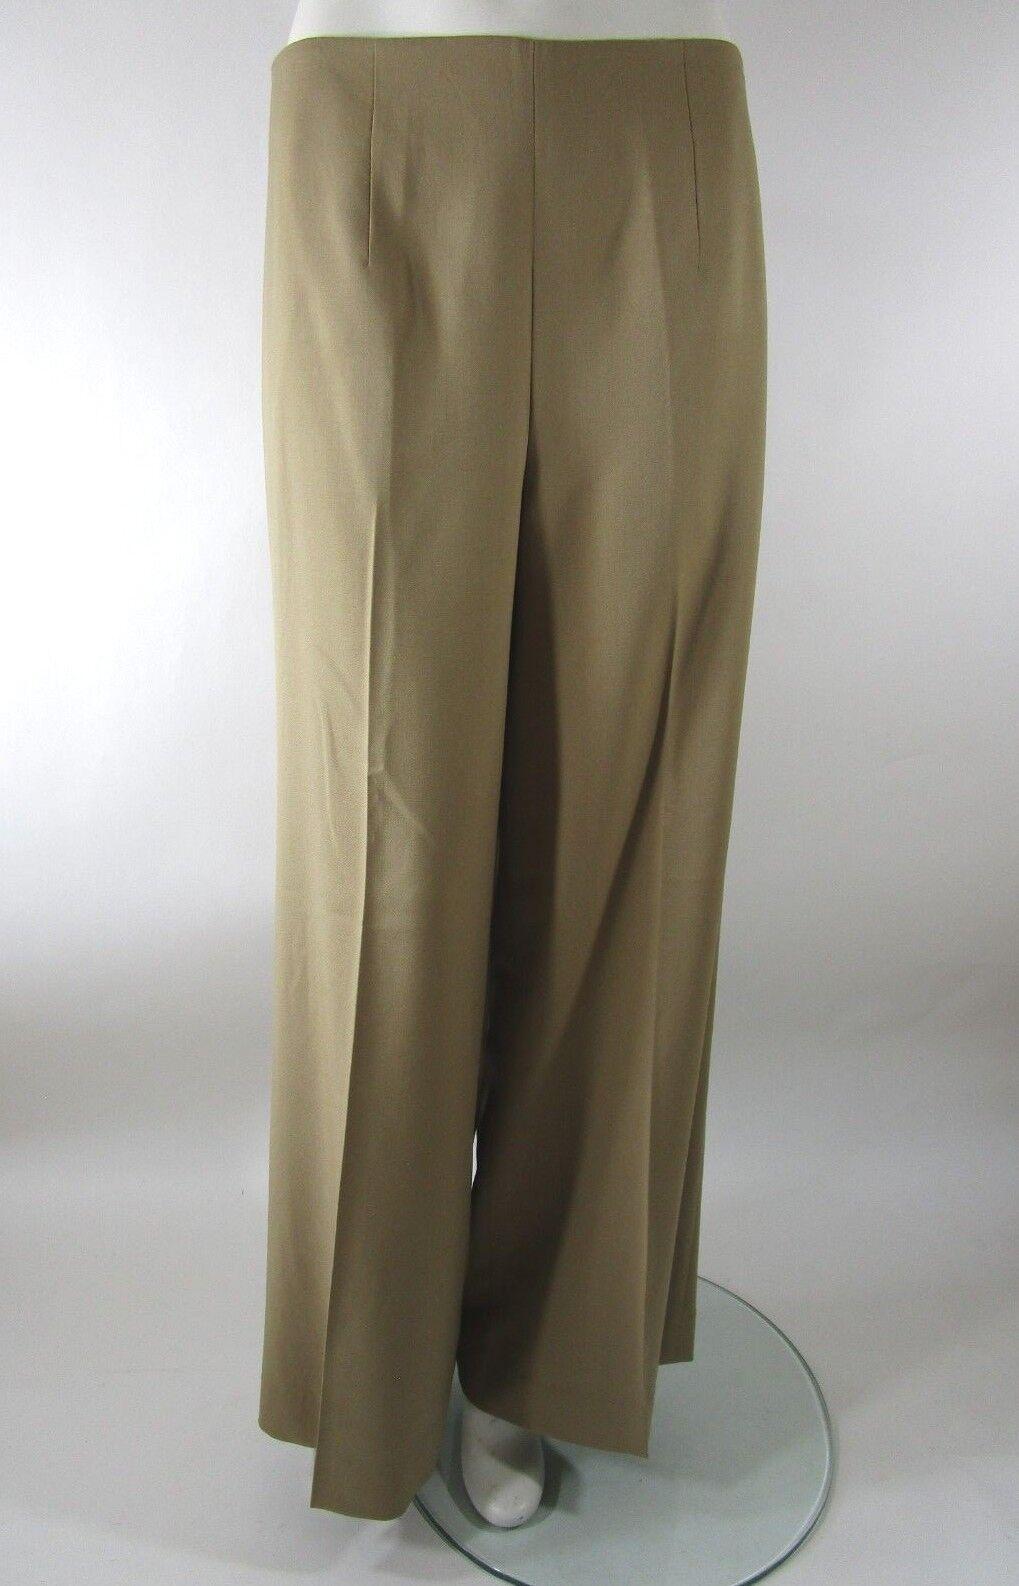 RALPH LAUREN blueE LABEL Tan Flat Front Wide Leg Wool Trouser Size 10